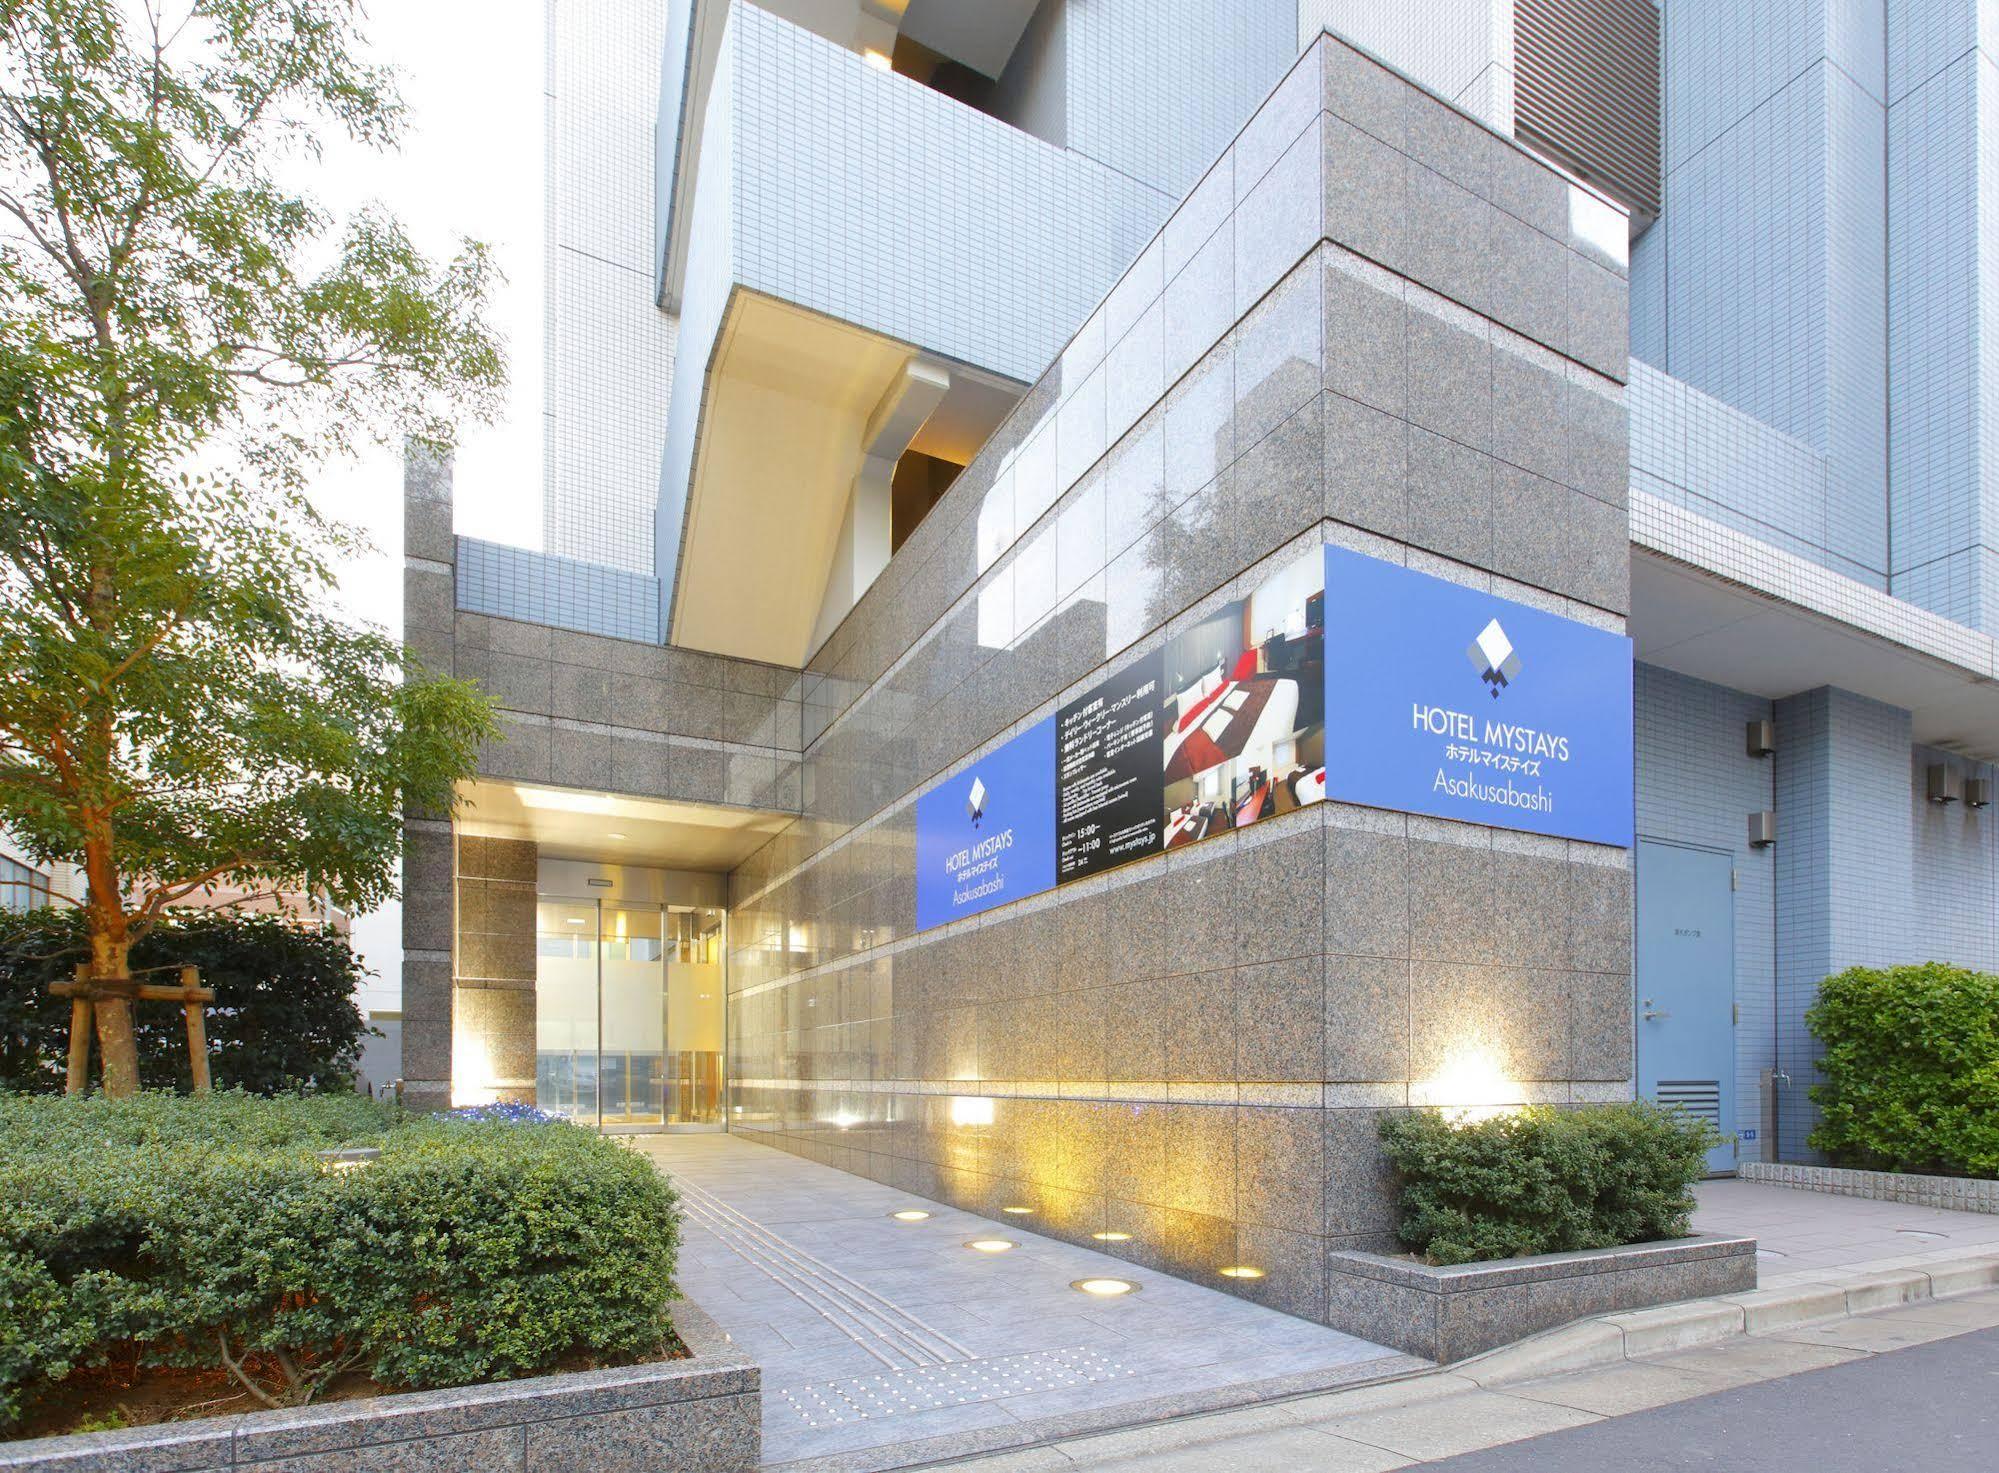 Hotel Mystays Asakusa Bashi